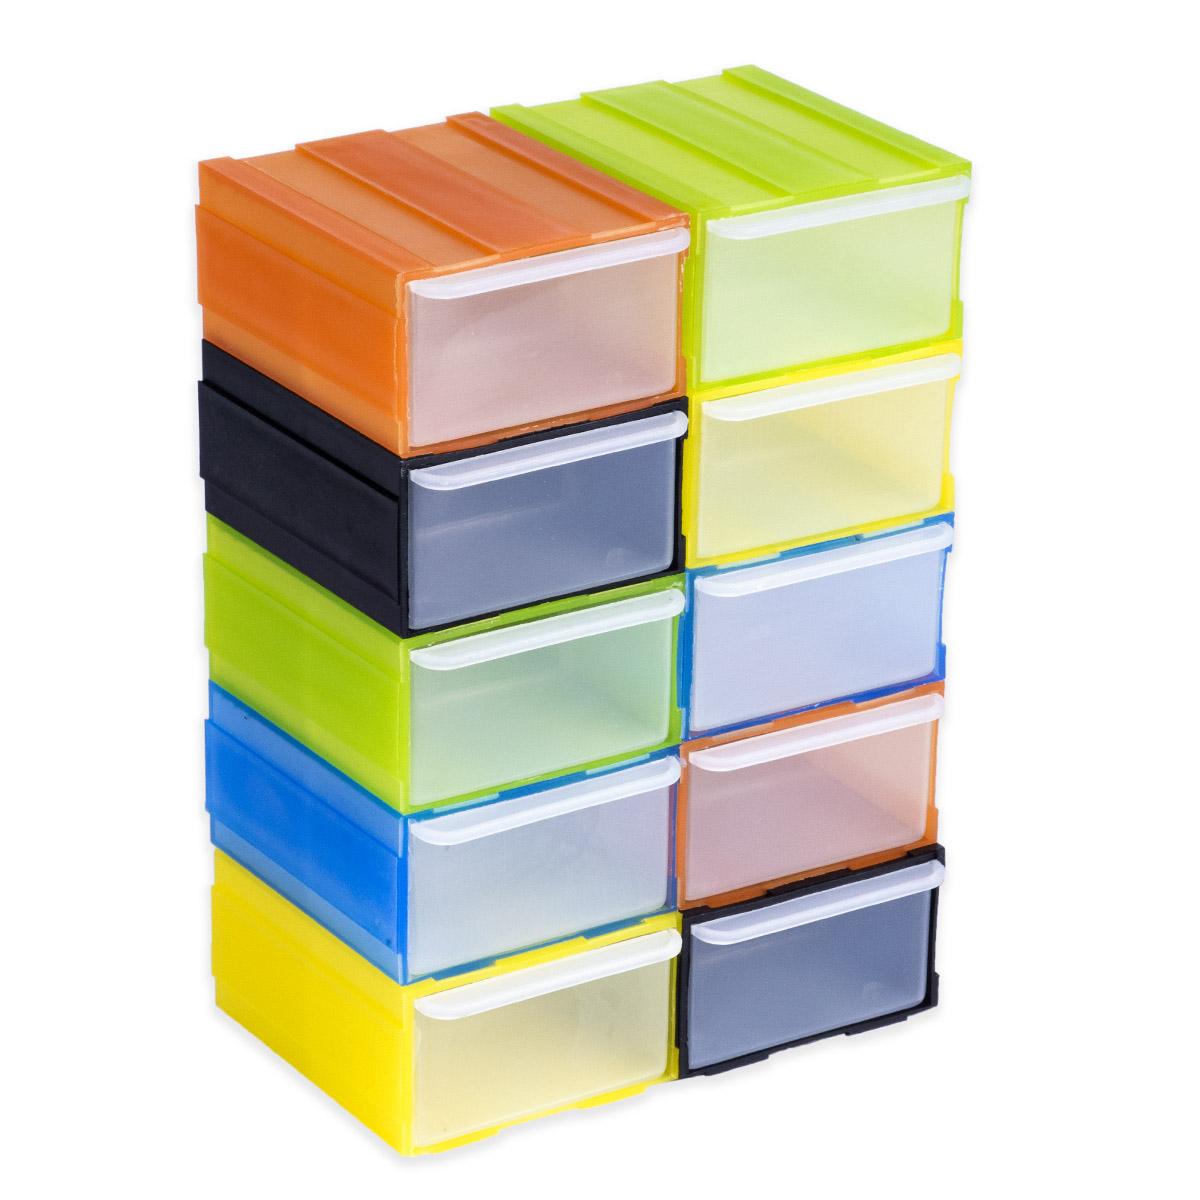 farbigee modularee Schubladenblock